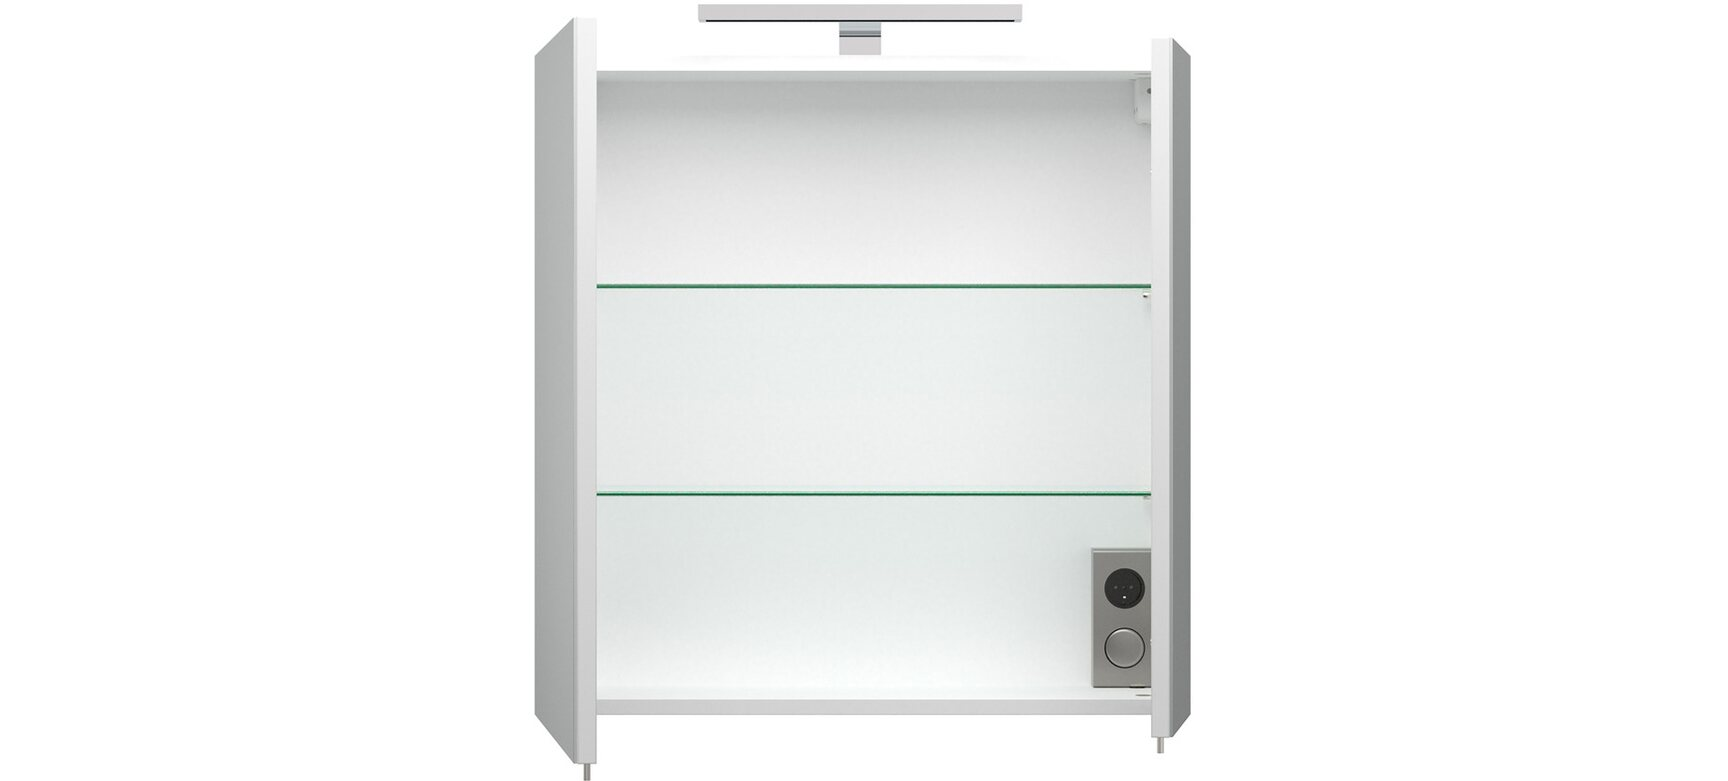 Emotion Badmöbel Komplett-Set EEK:A++ Pro 60 cm Weiß Hochglanz 9 ...